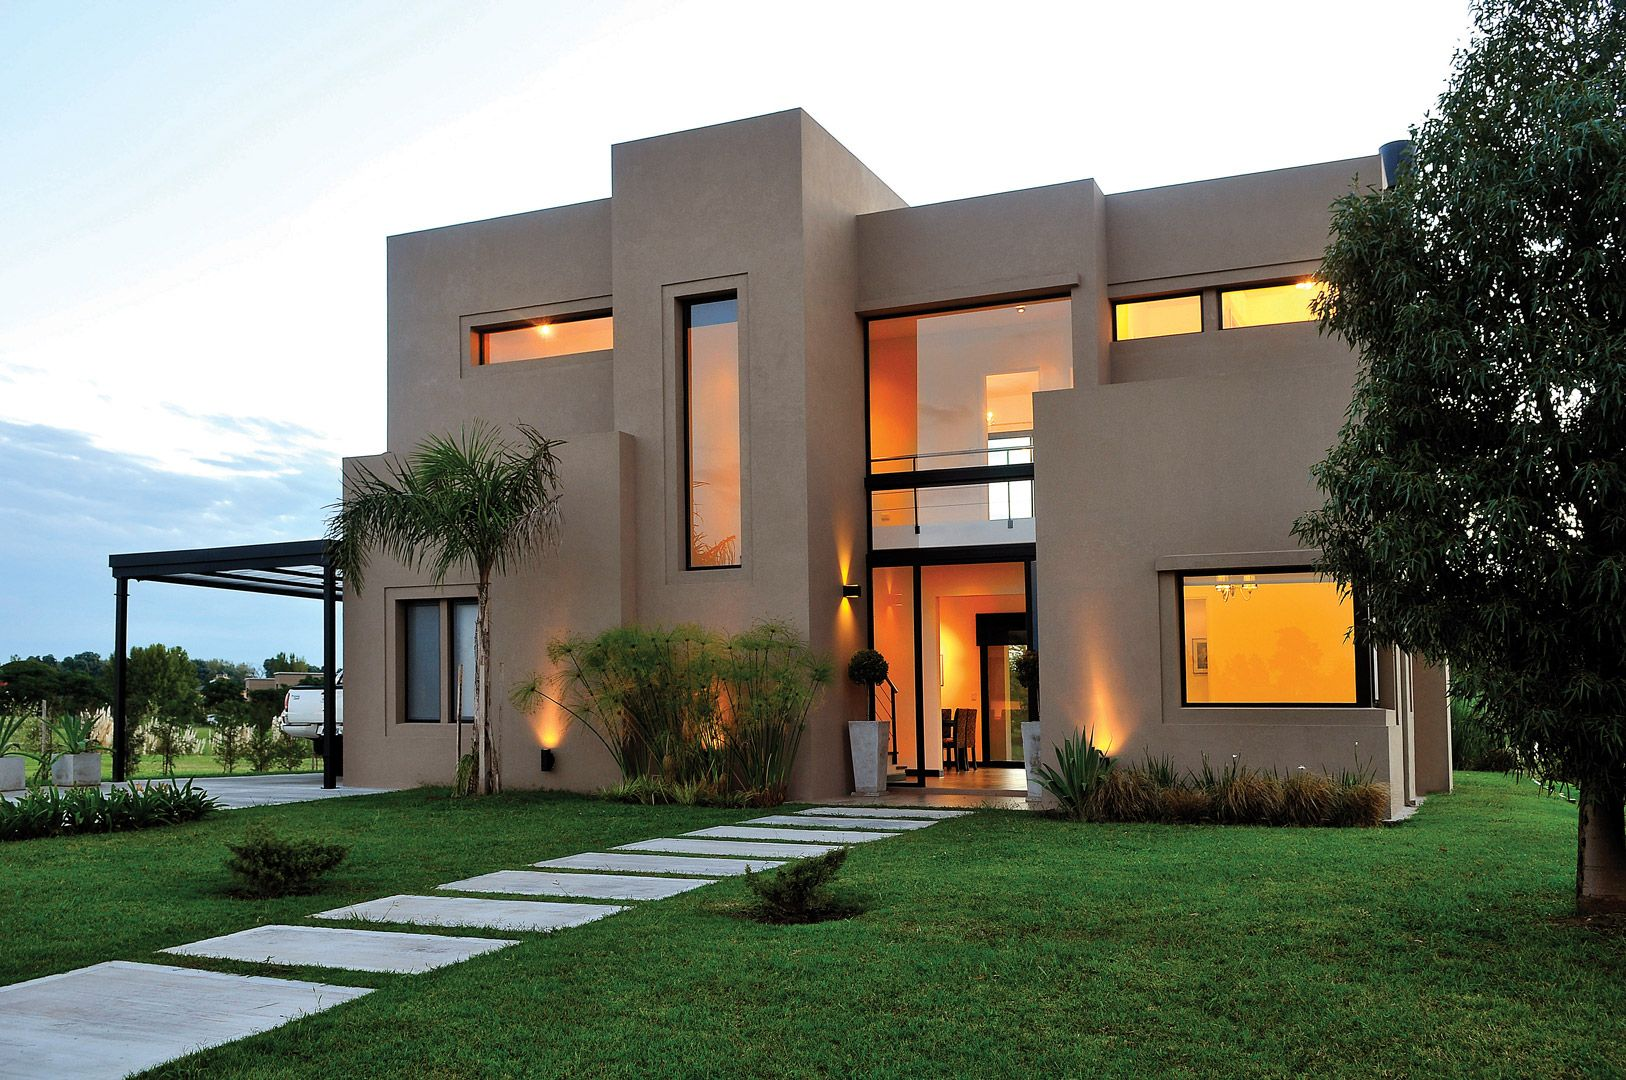 marcela parrado arquitectura arquitectura casas portal